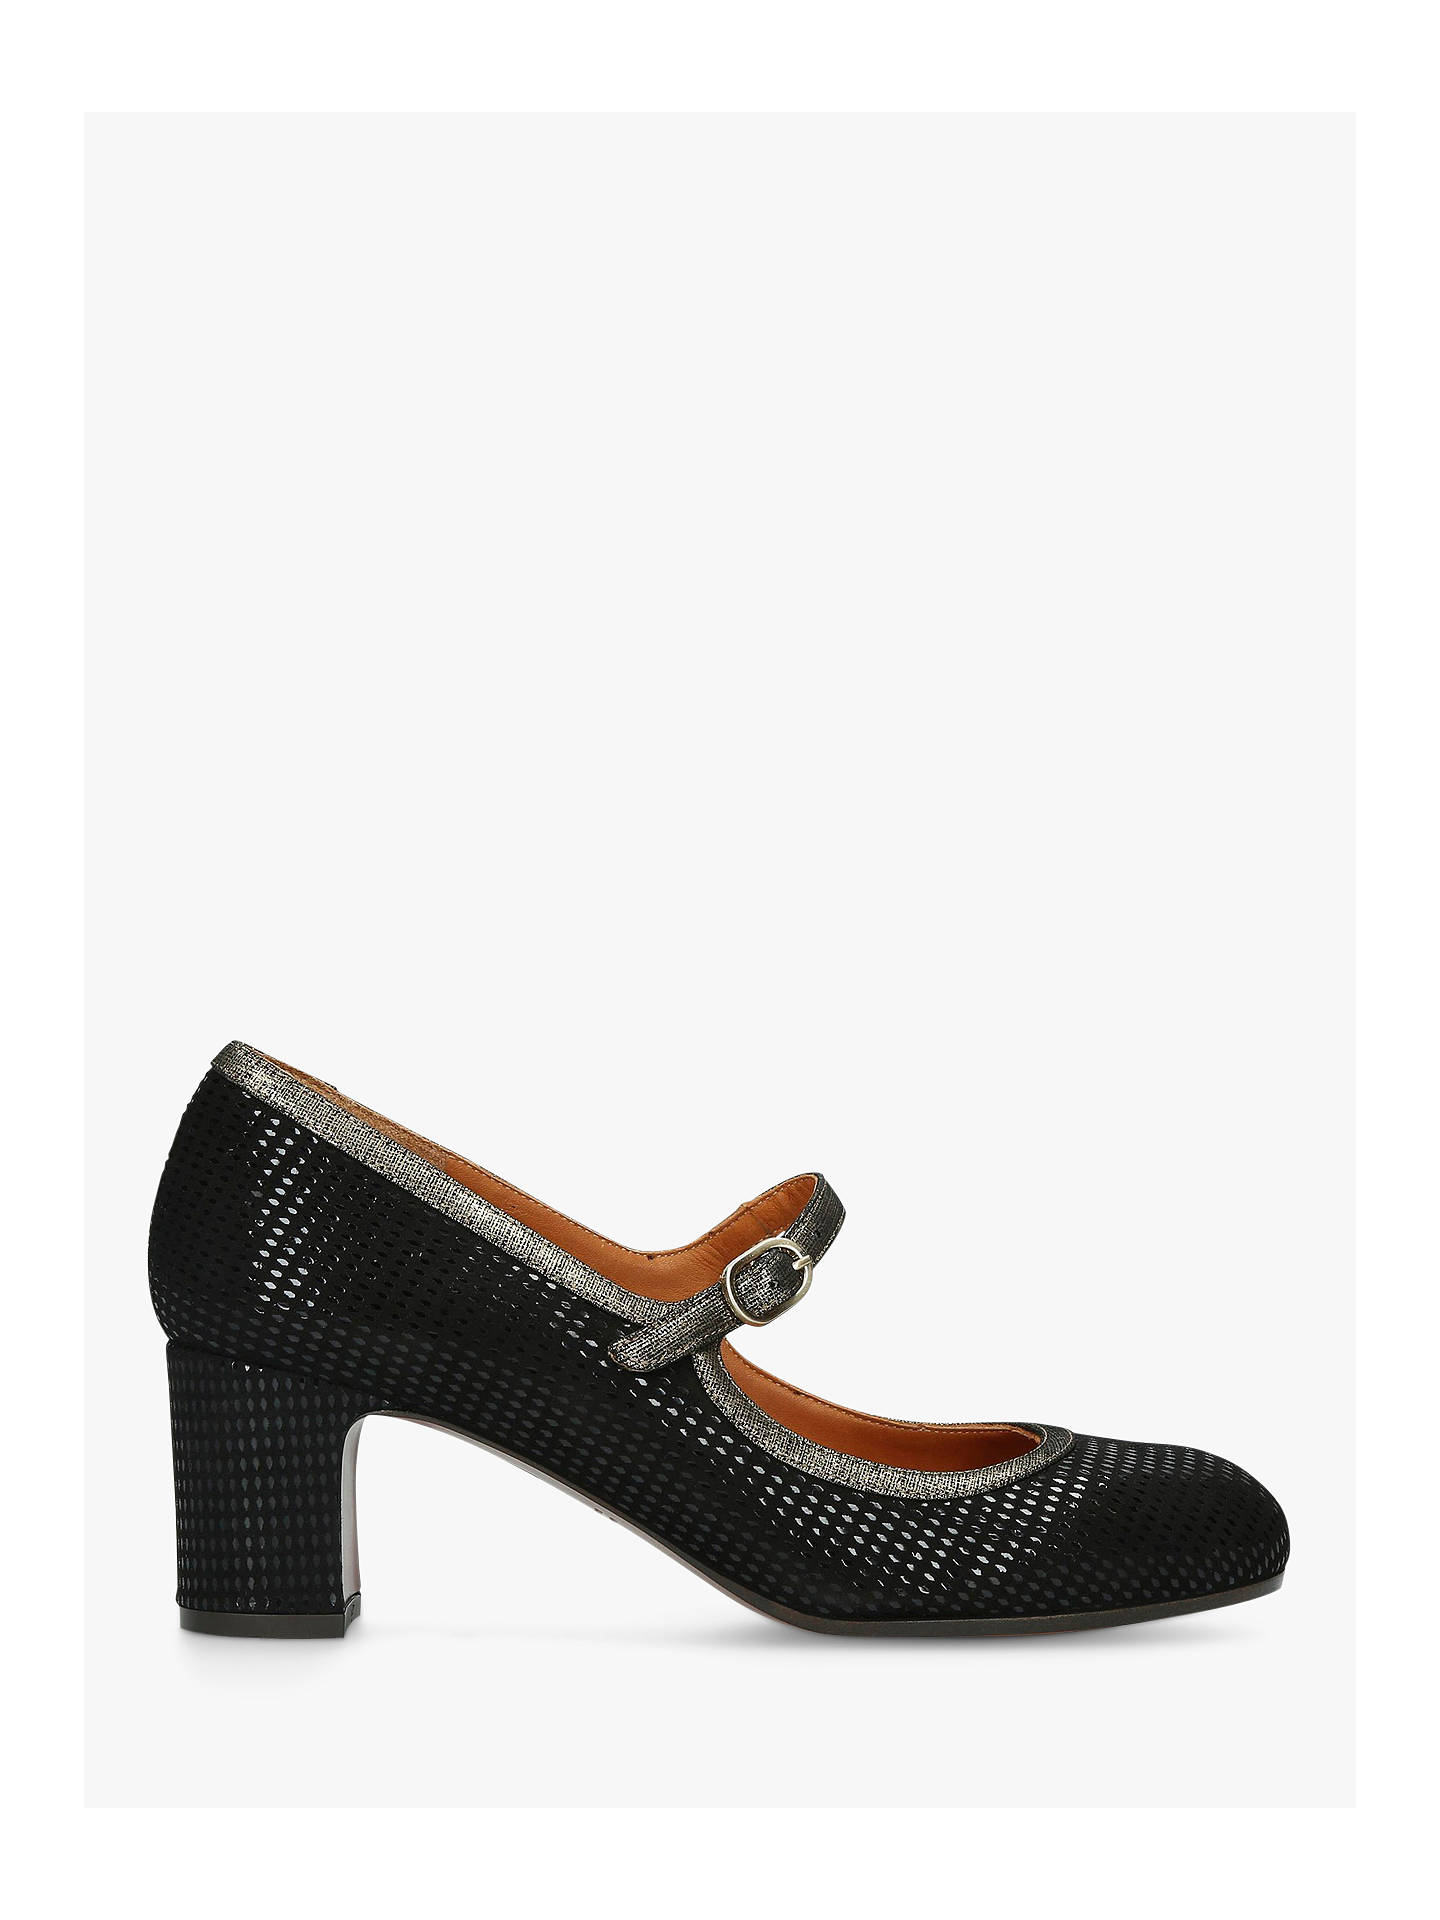 21d9f942c7ca0 Buy Chie Mihara Happo Mid Heel Court Shoes